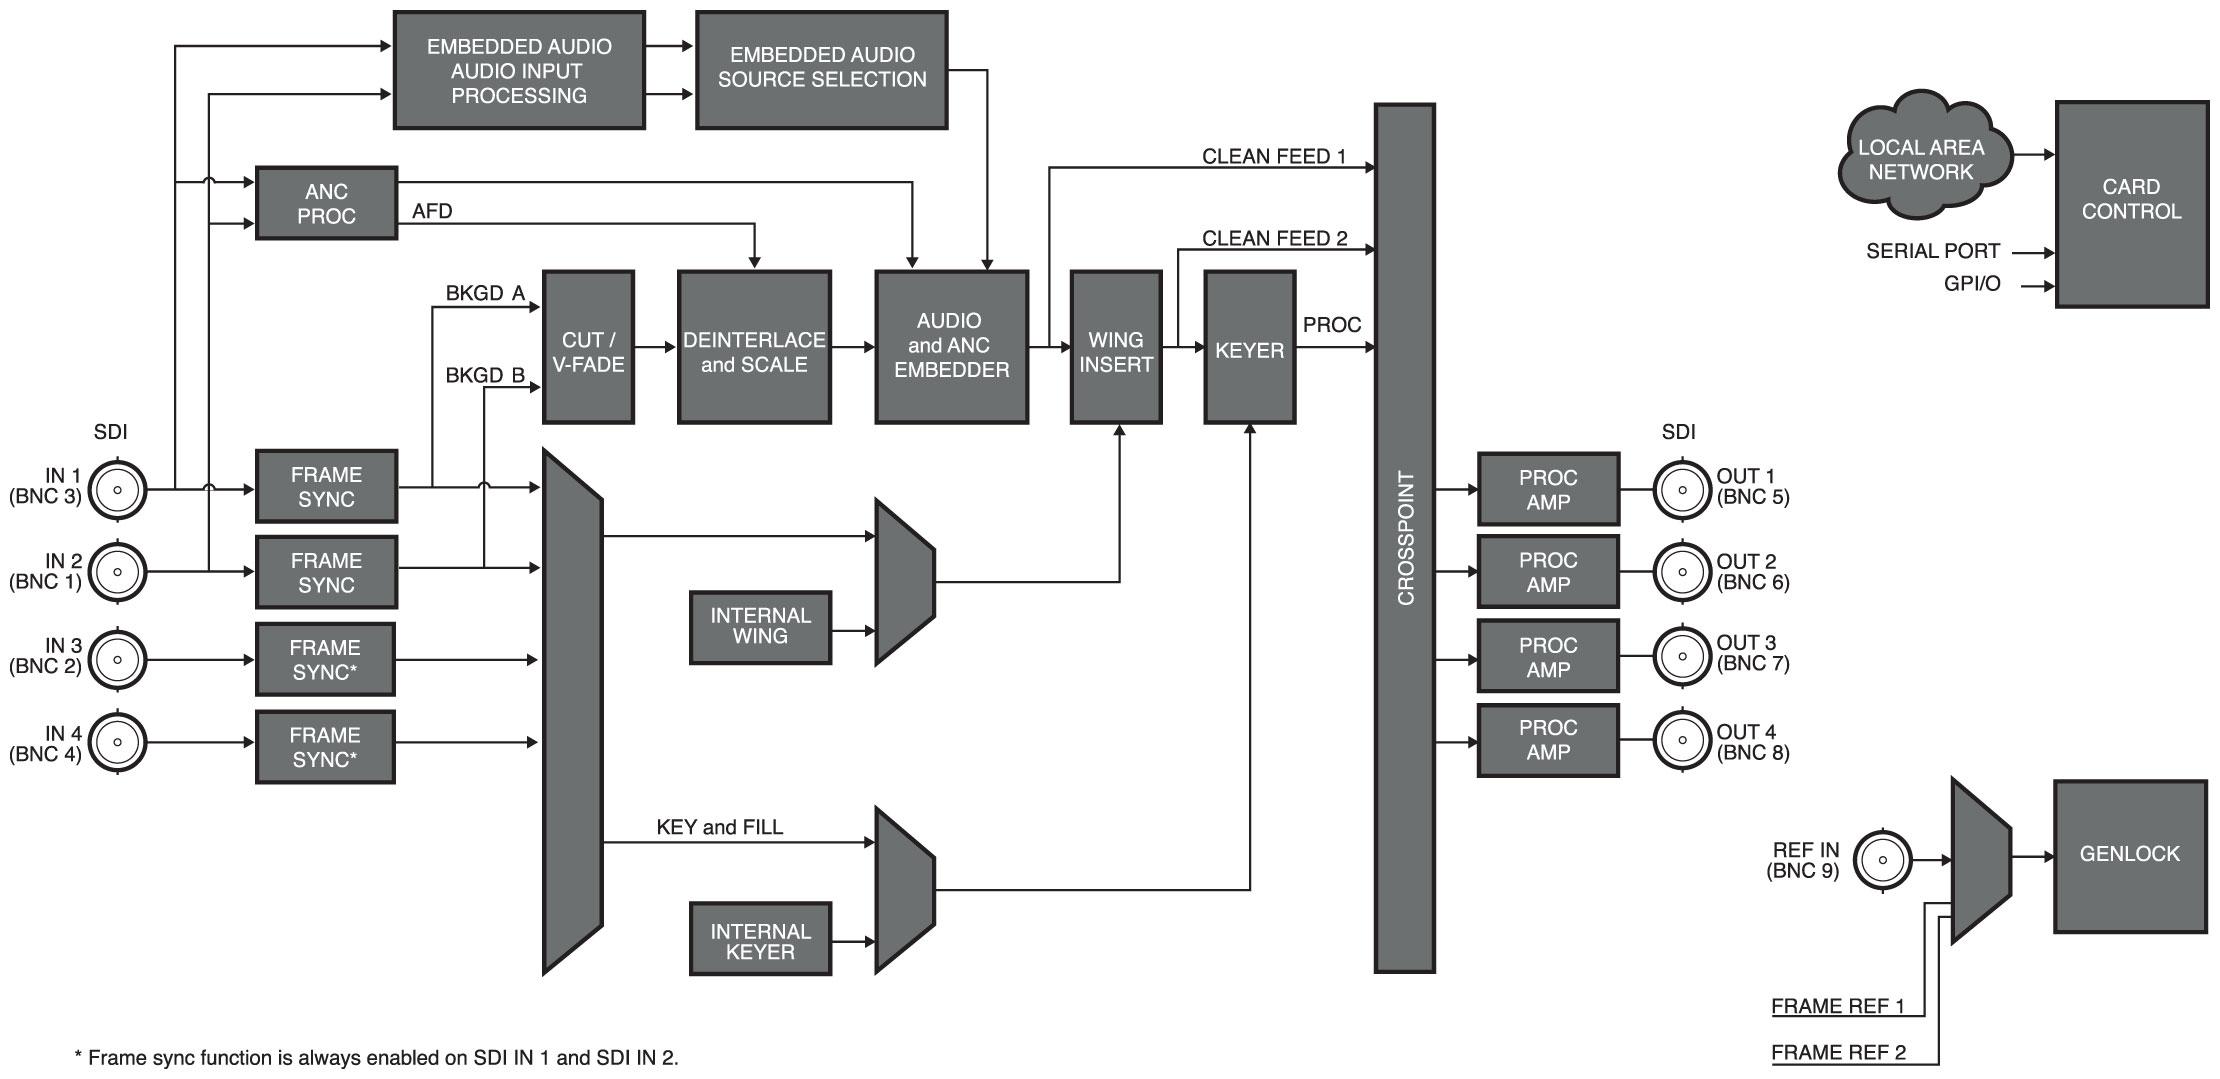 UDC-8625A 3G / HD / SD SDI Multi-Function Format Converter